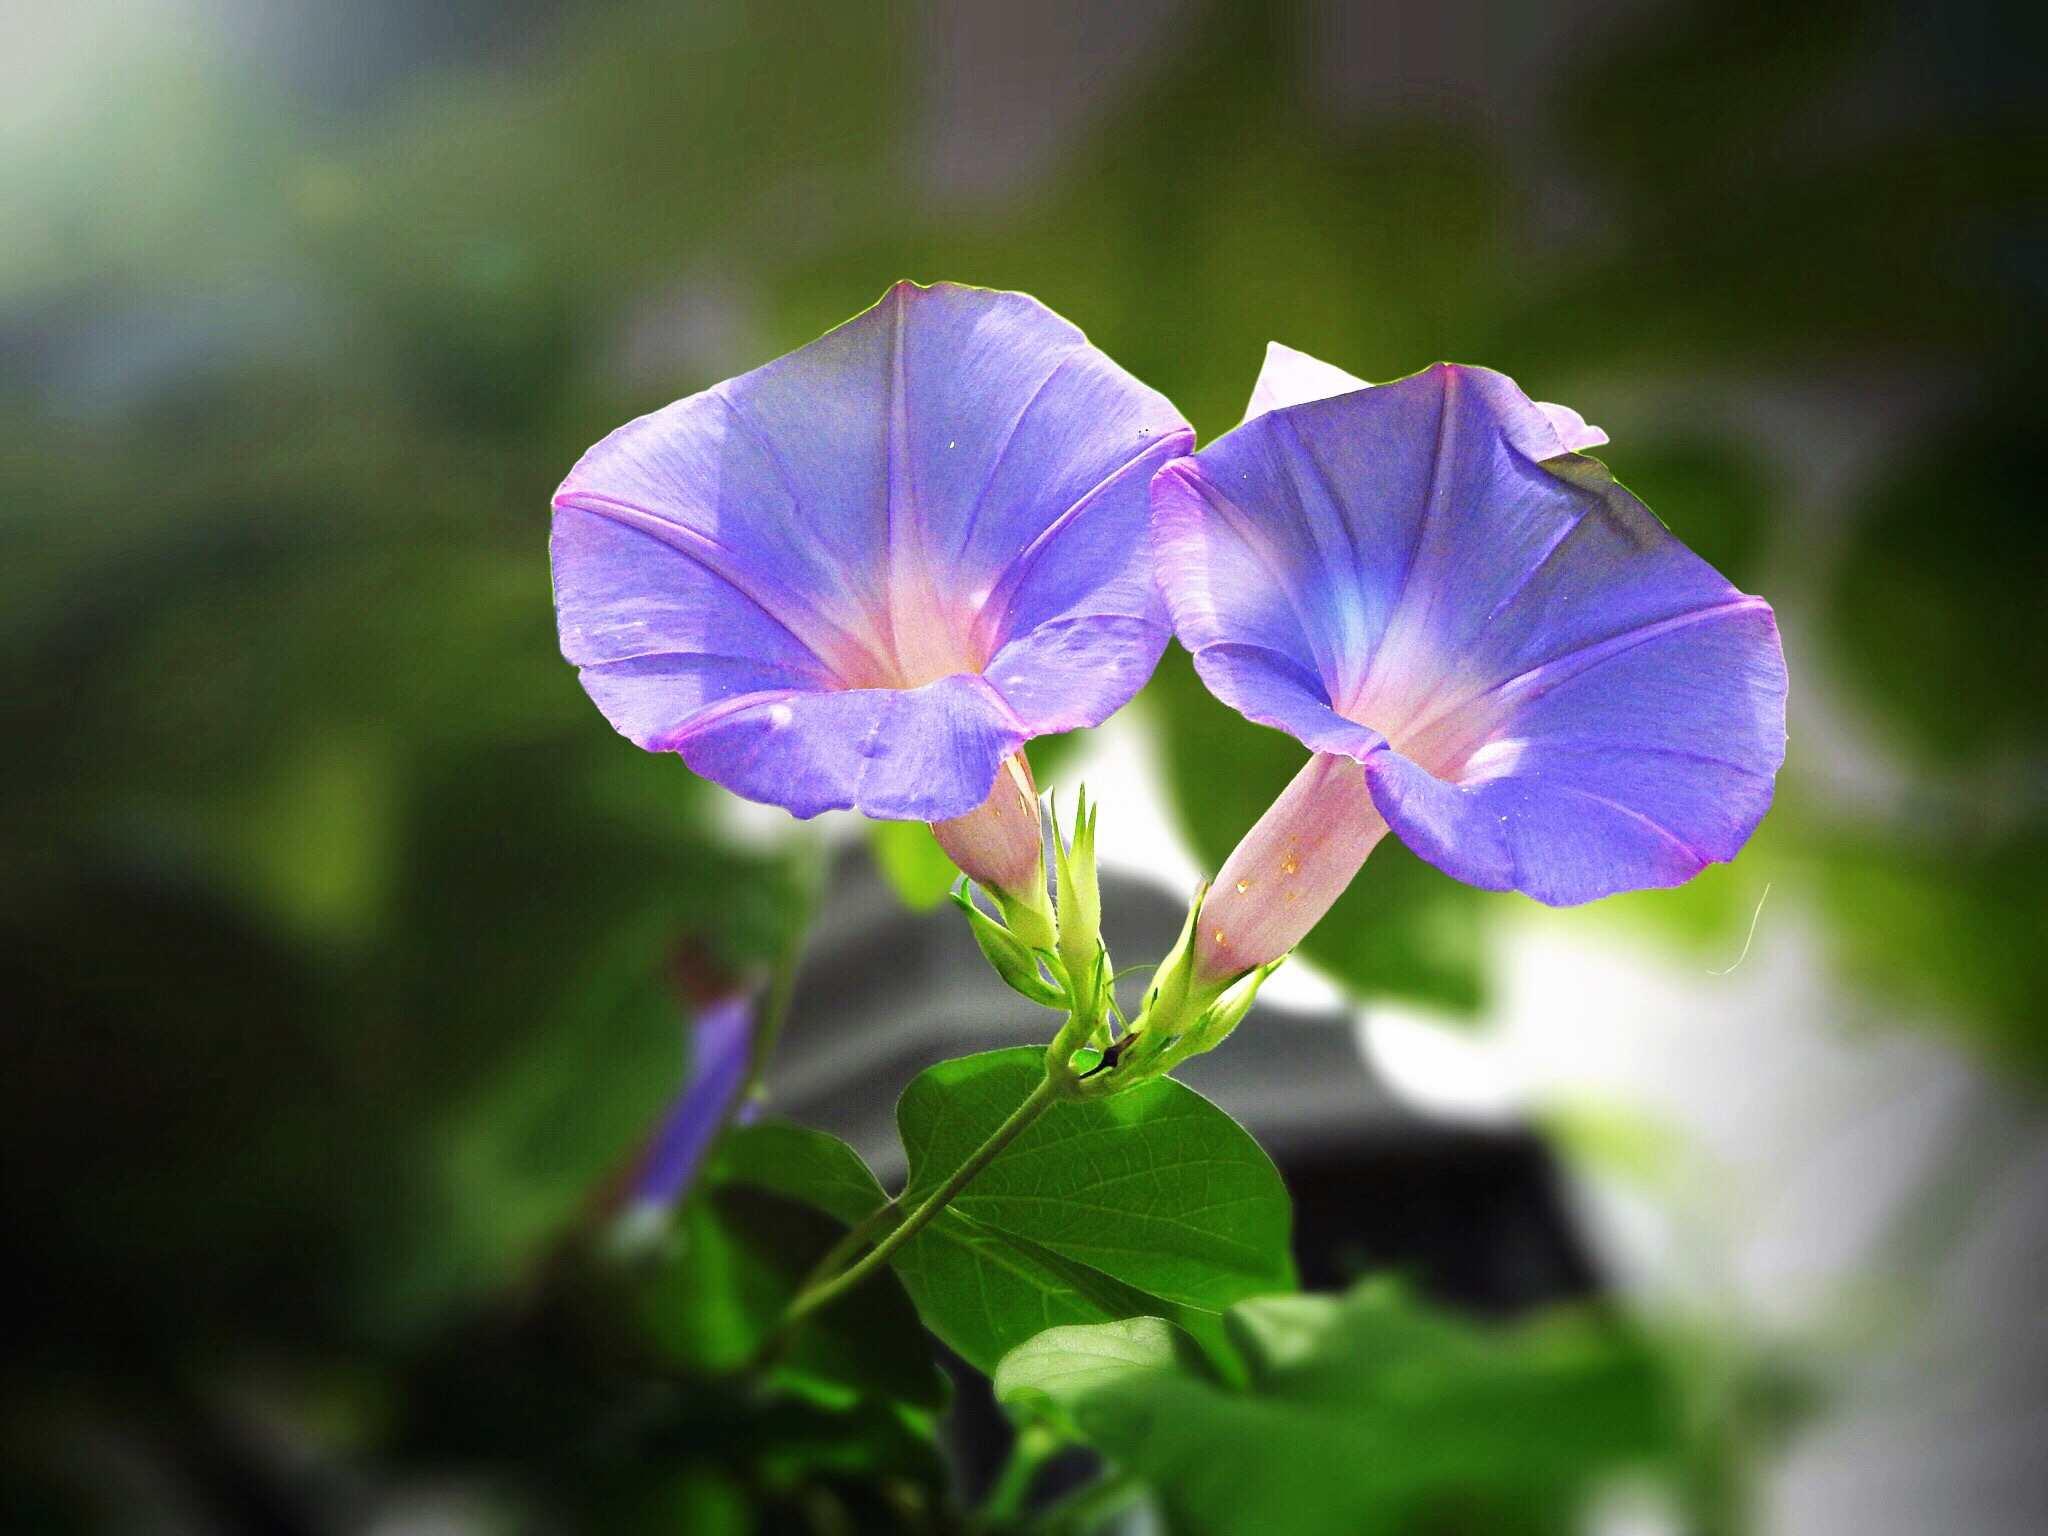 Morning glories blooming outdoors